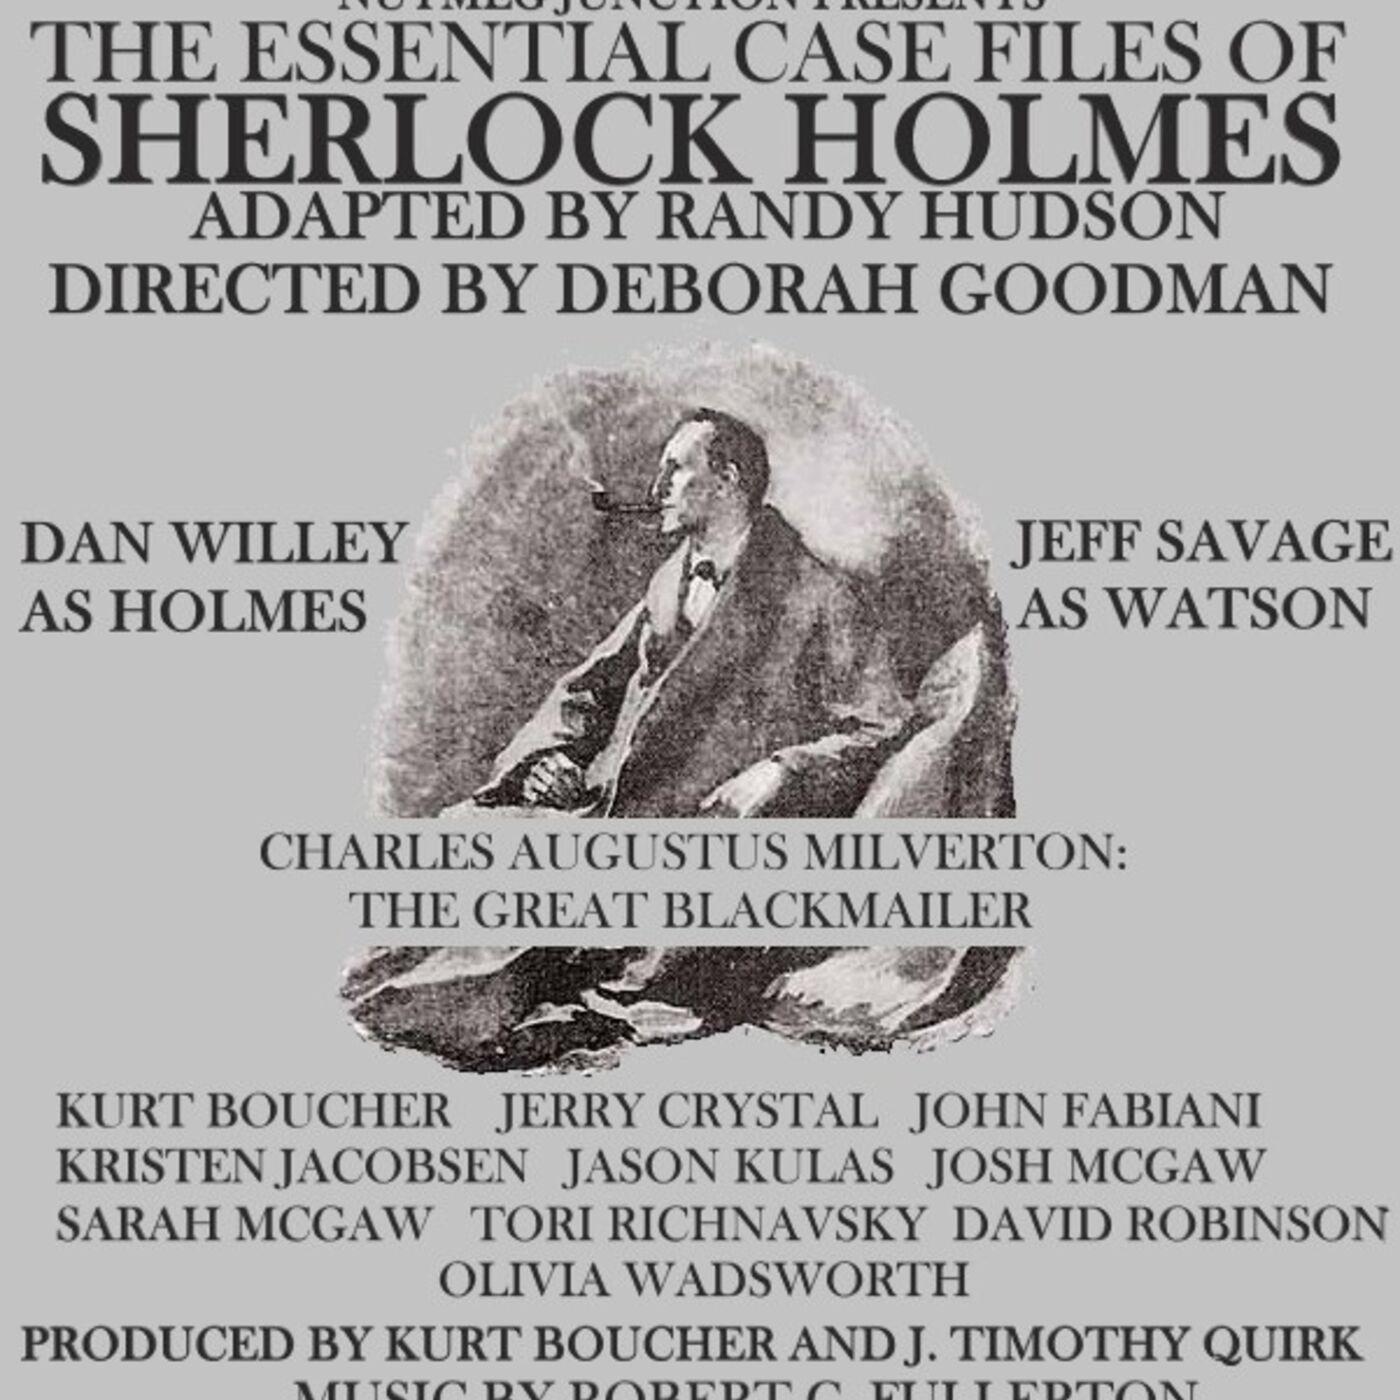 Sherlock Holmes: Charles Augustus Milverton-the Great Blackmailer